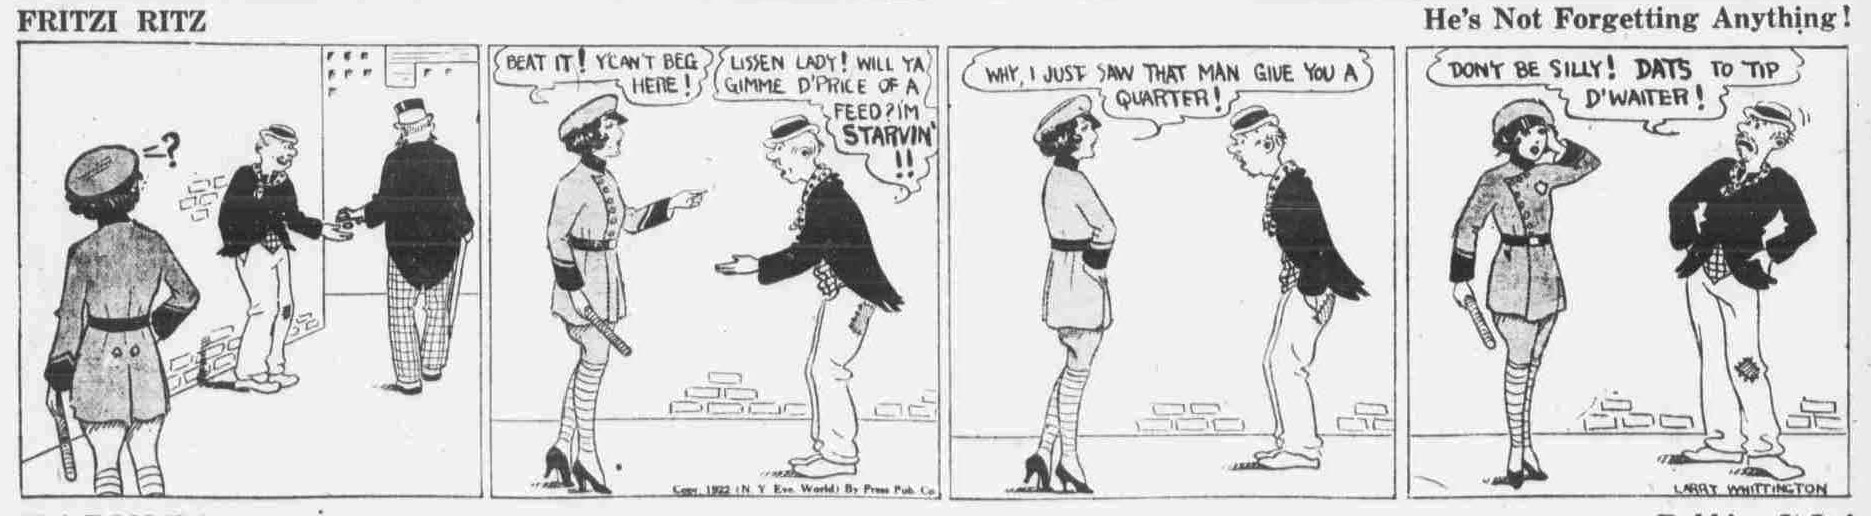 Nov. 8, 1922